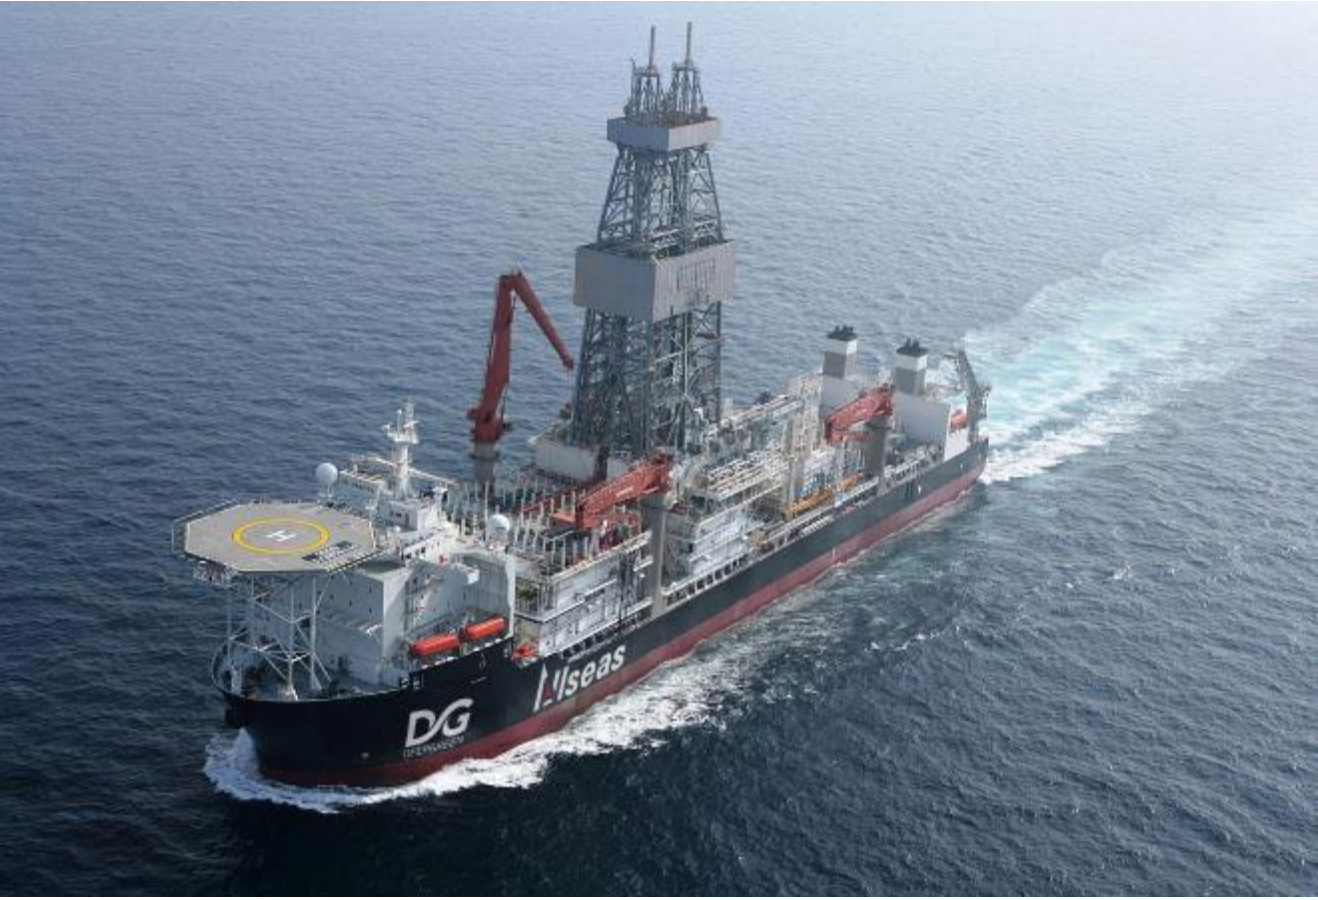 Allseas selects Seatools for deep-sea mining equipment